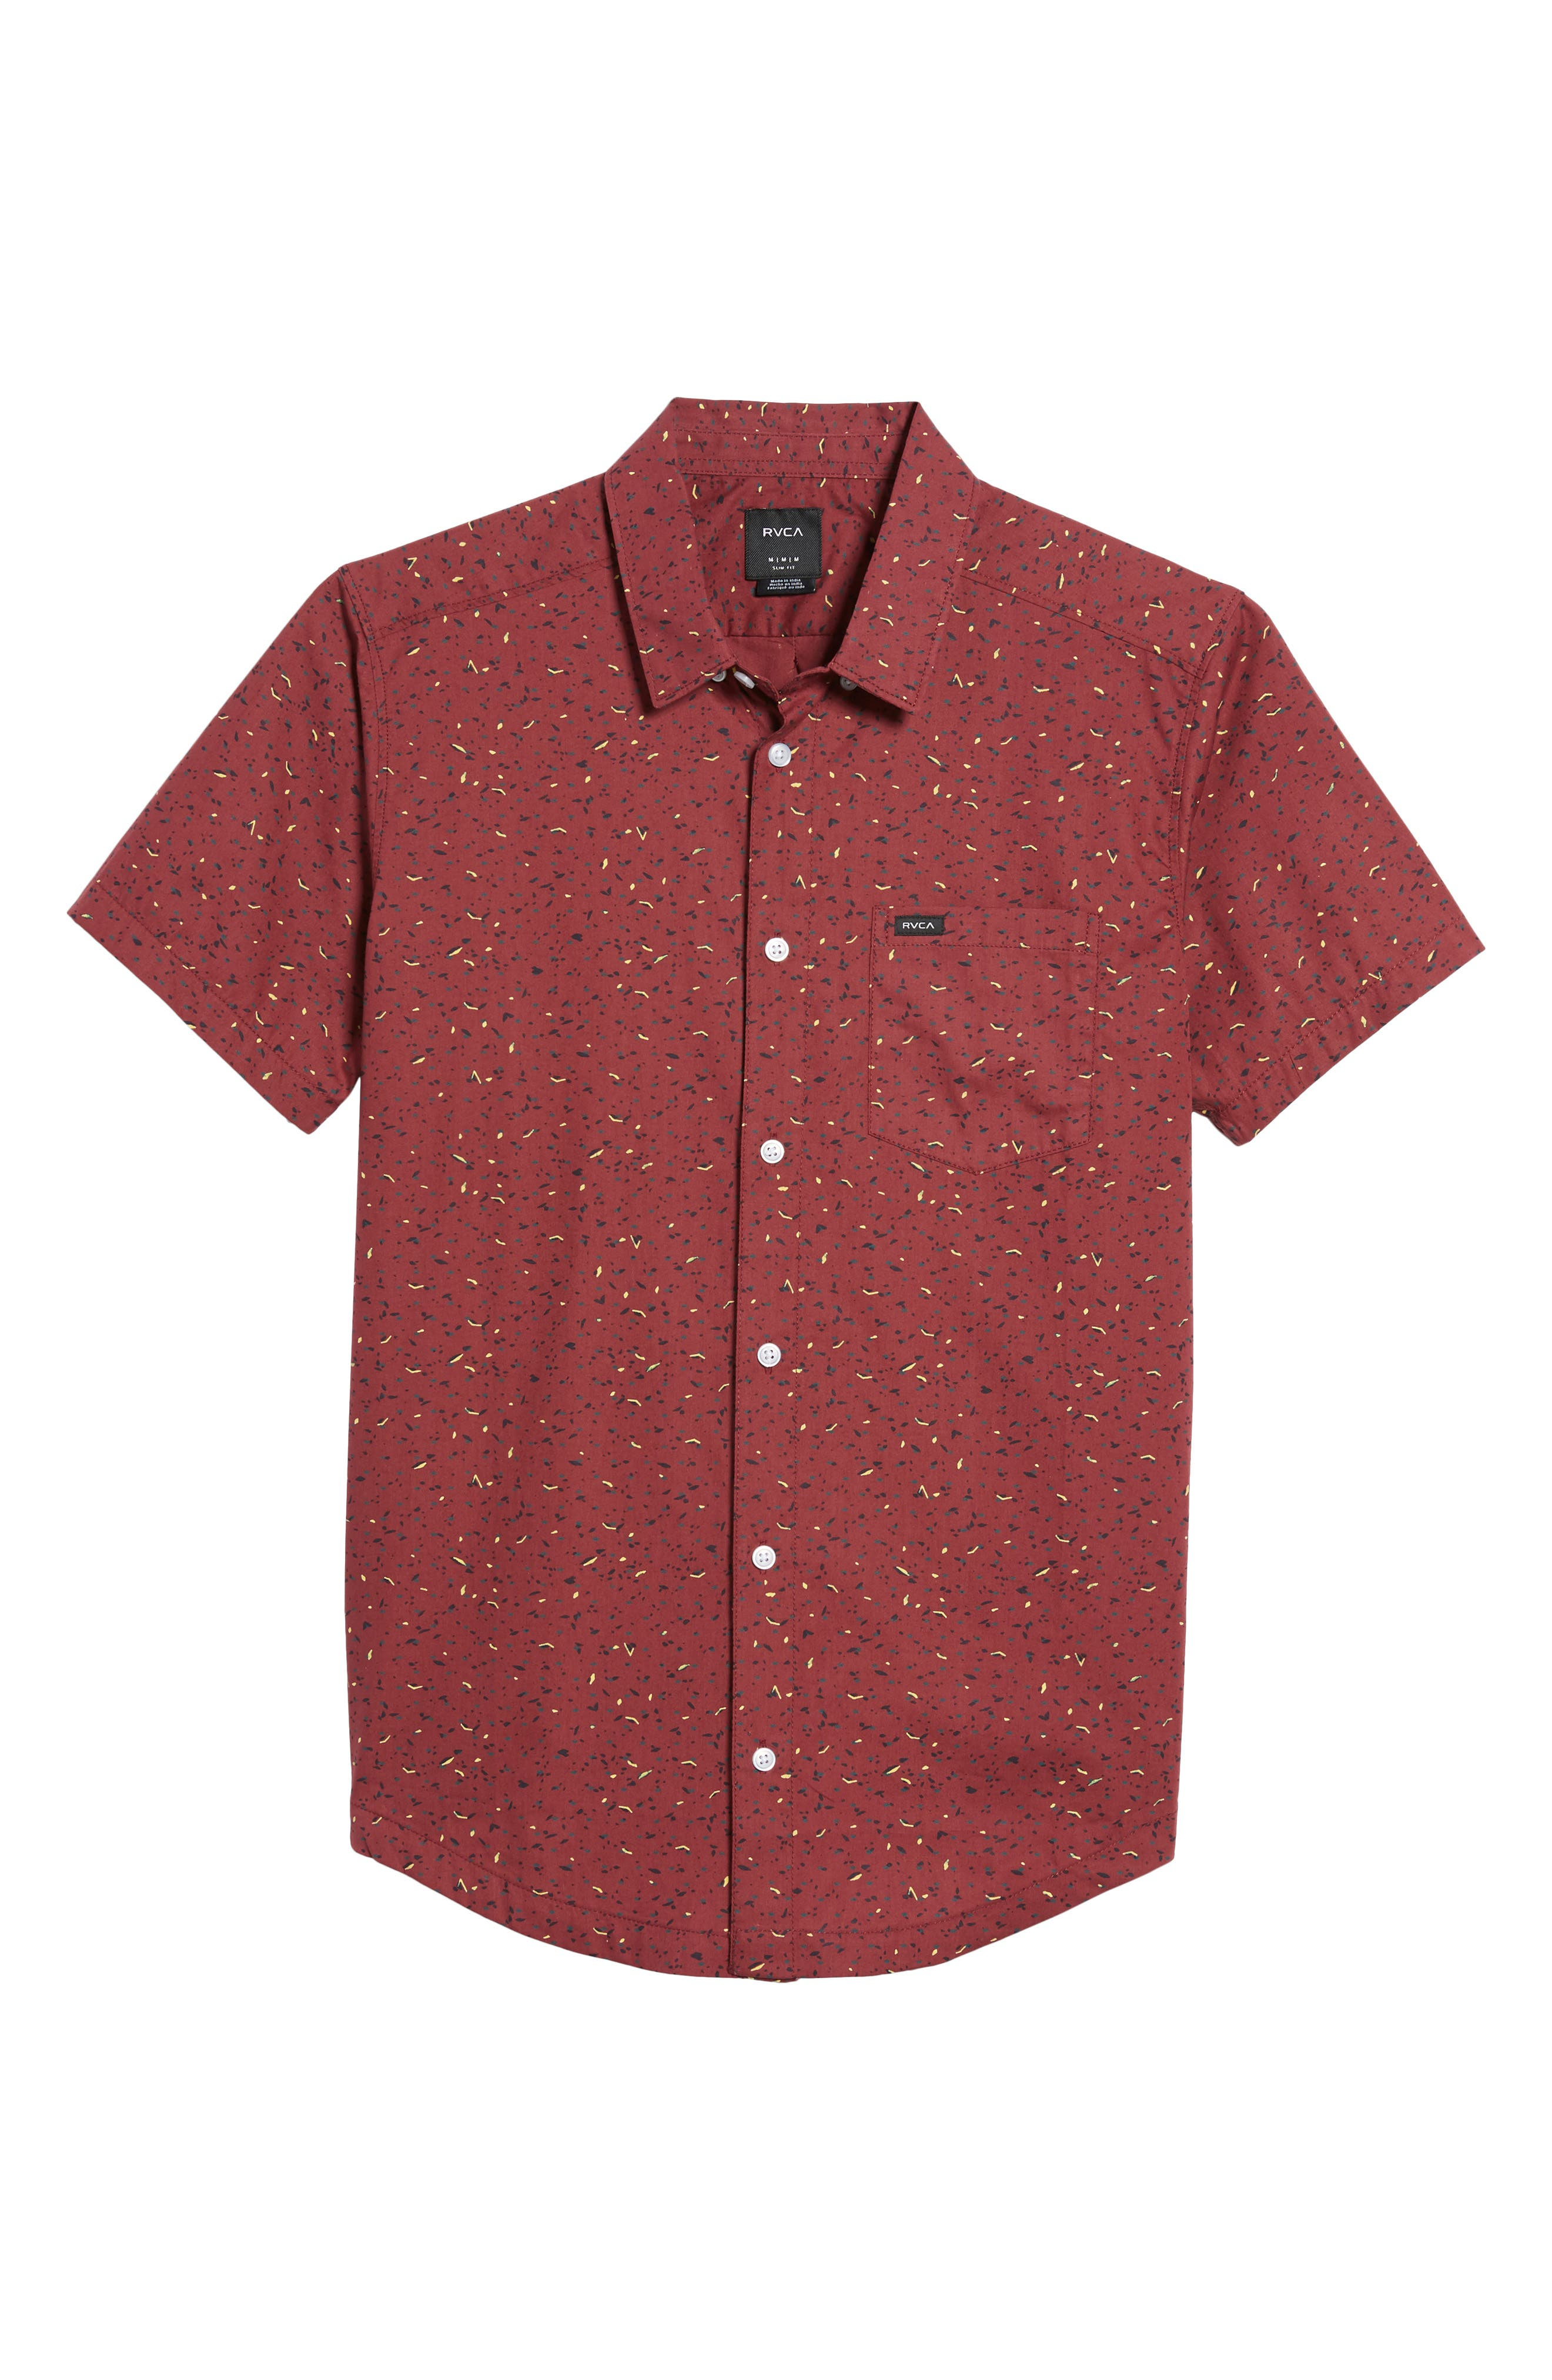 Jaded Woven Shirt,                             Alternate thumbnail 6, color,                             Tawny Port